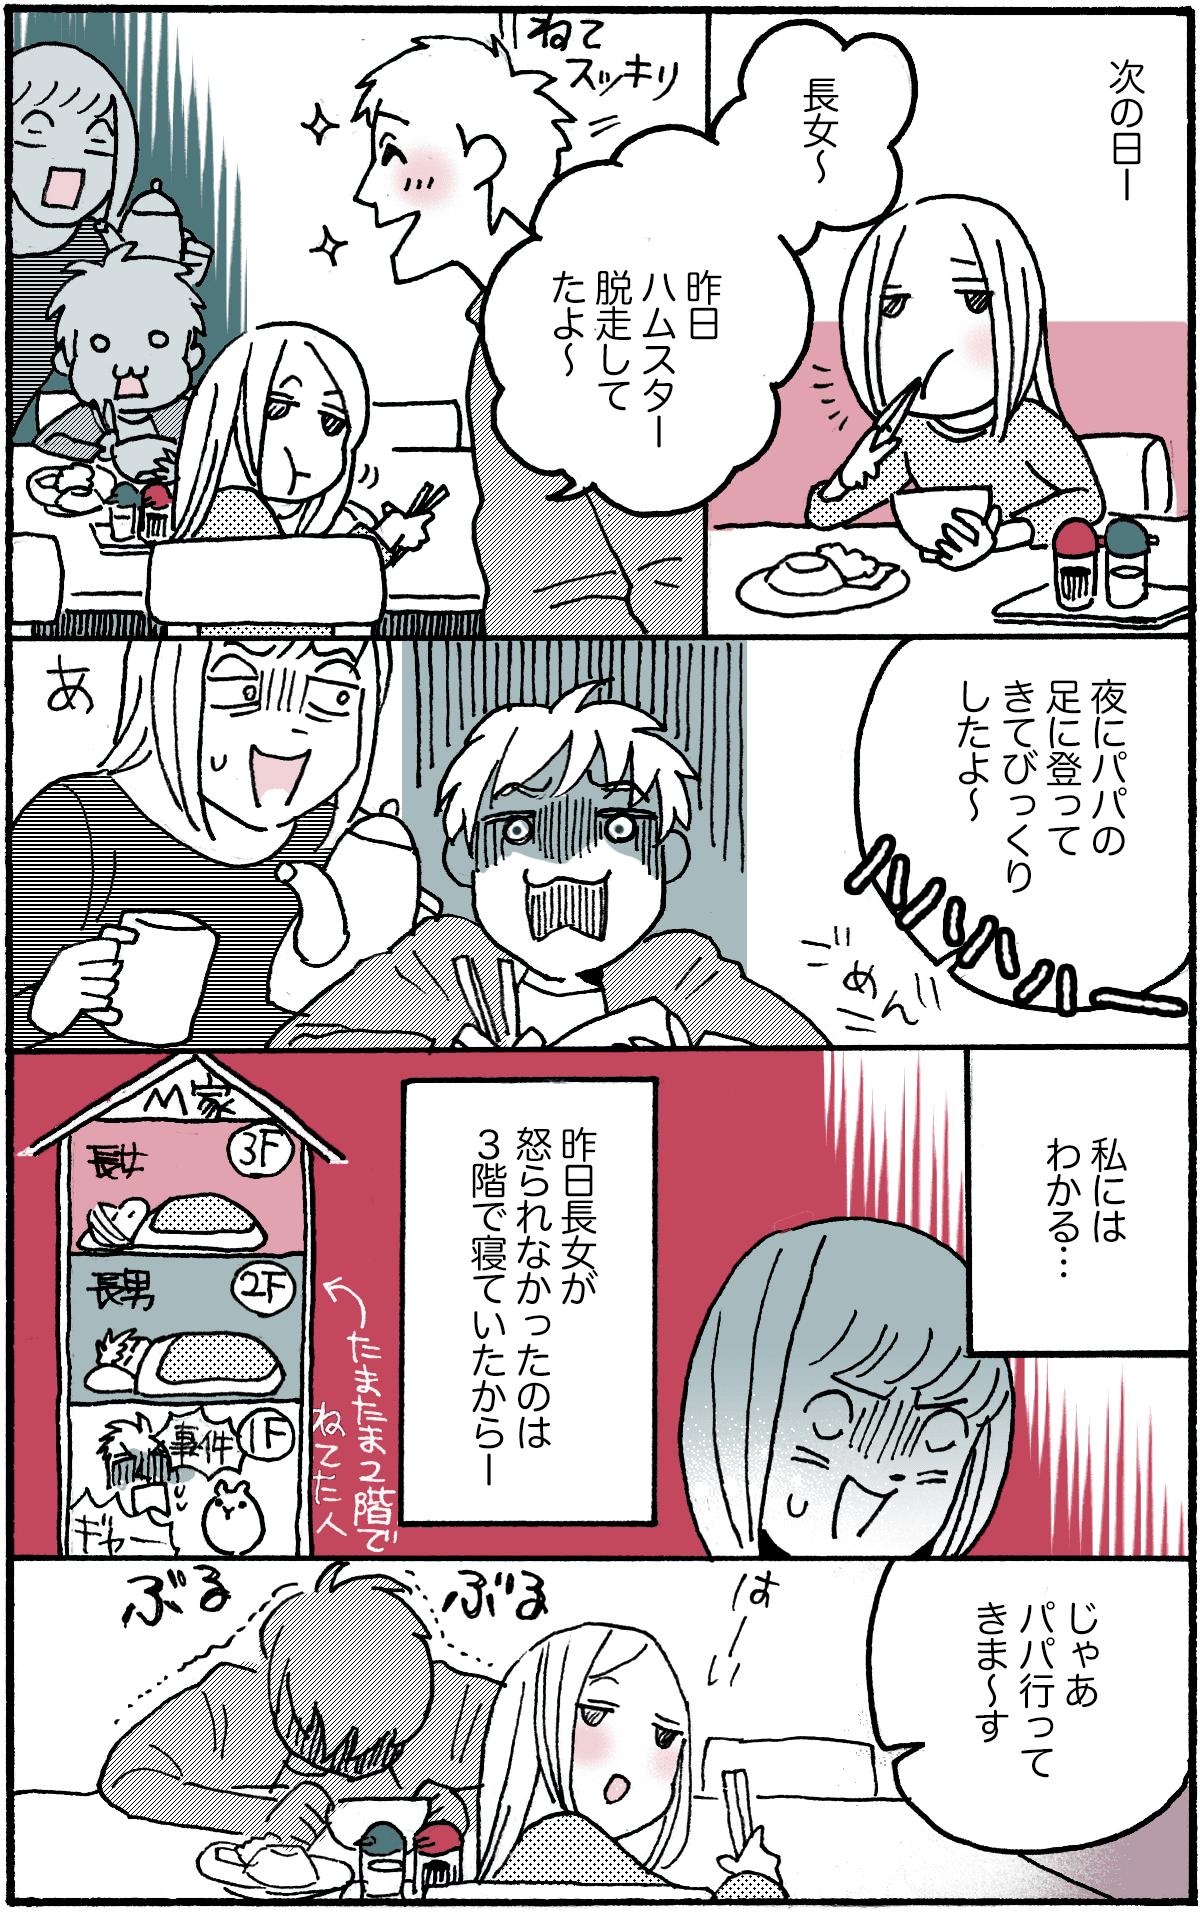 MK3_03